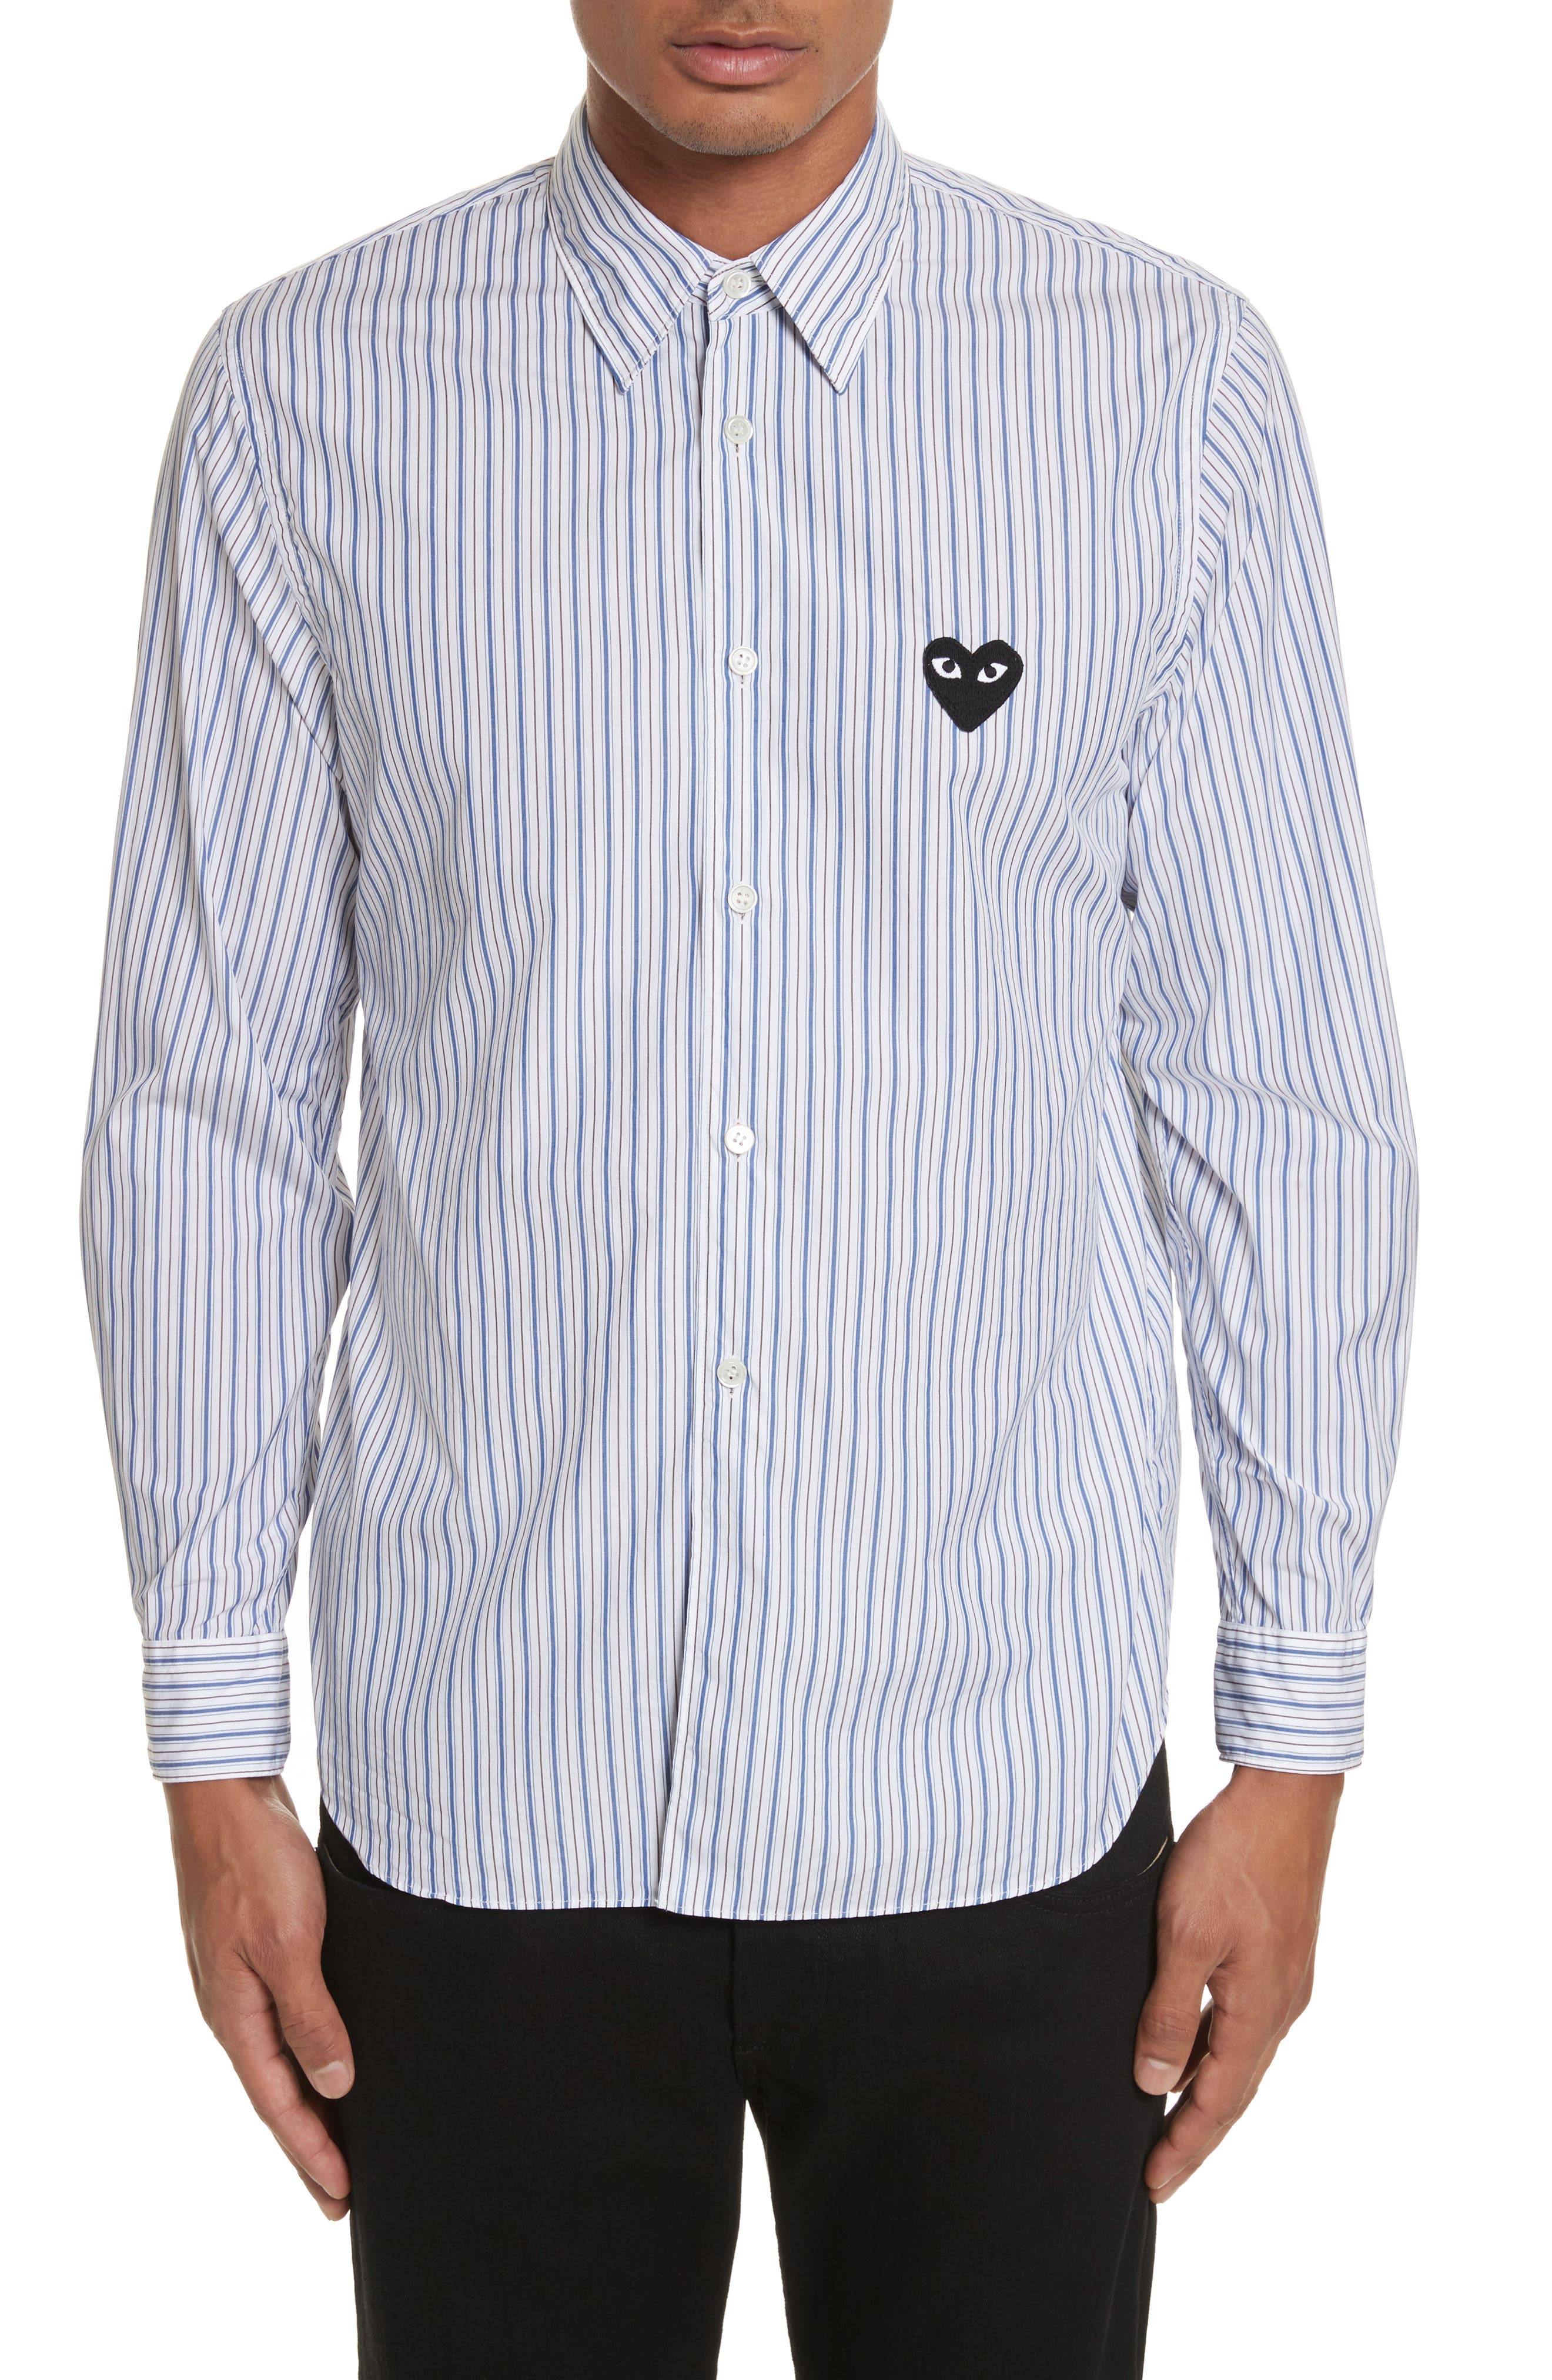 PLAY Black Heart Stripe Oxford Shirt,                         Main,                         color, Blue